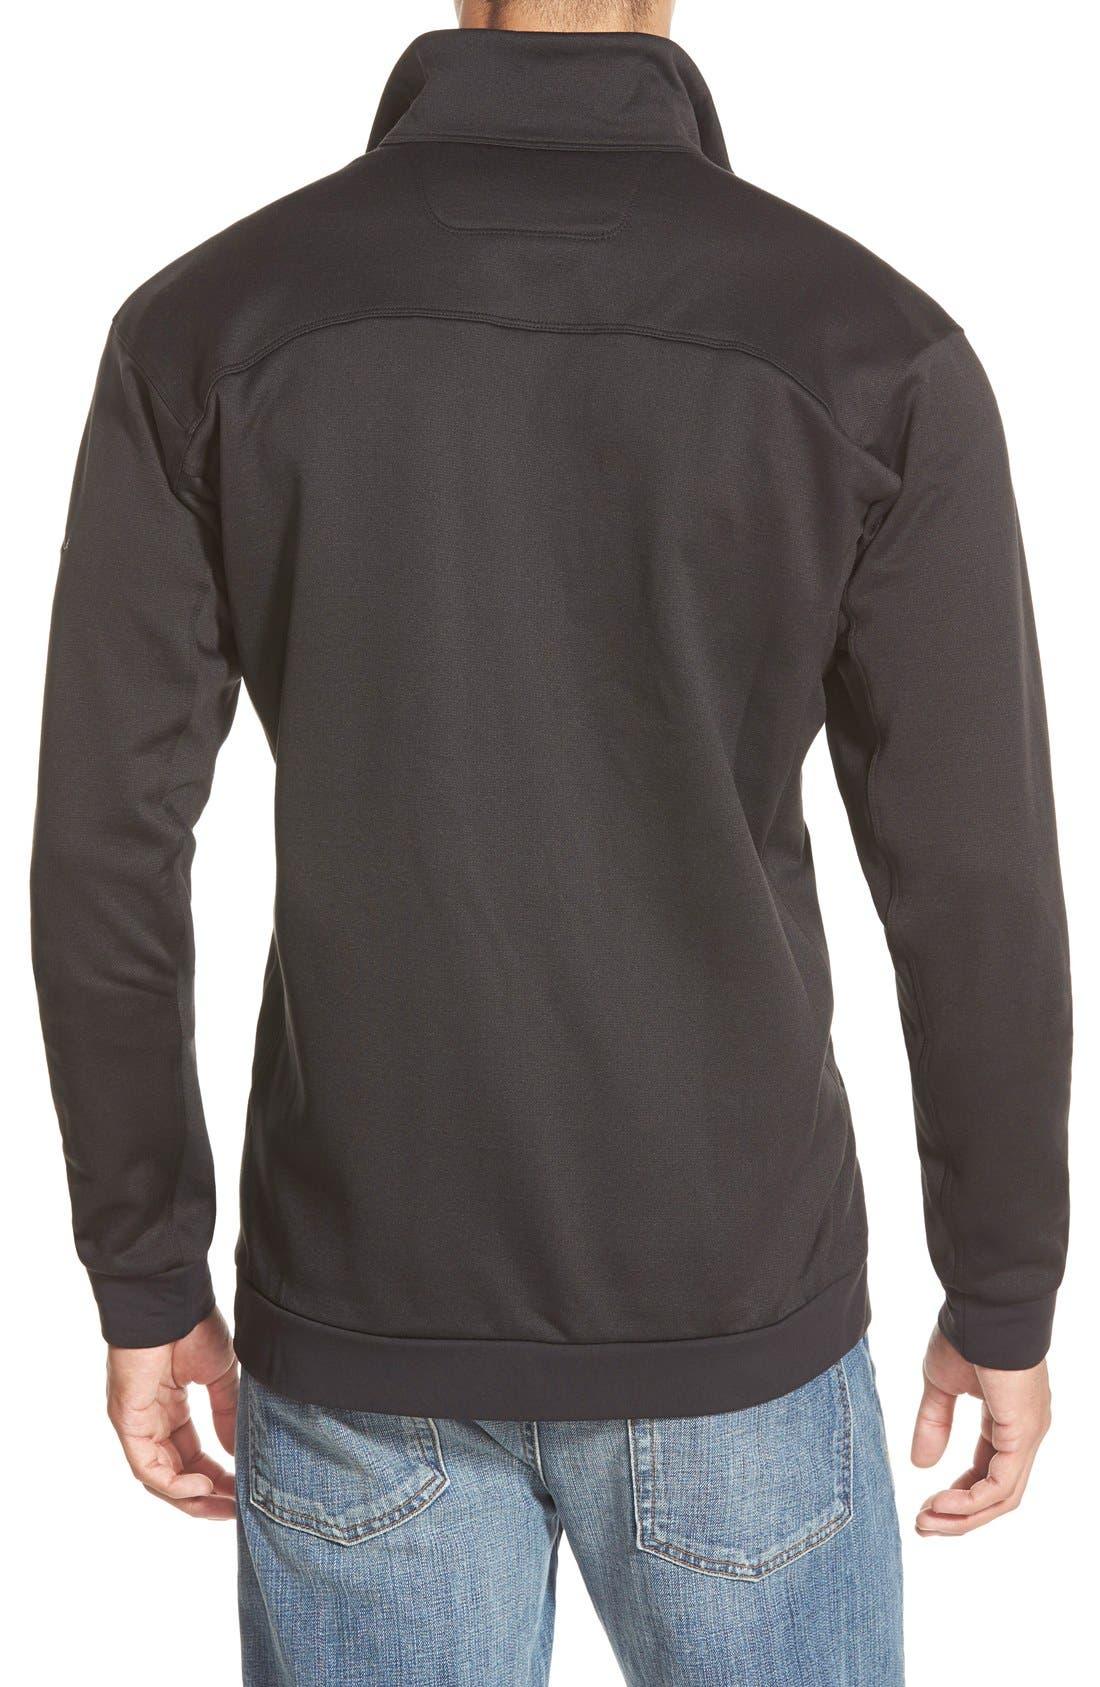 'Straibo' Midweight Technical Fleece Jacket,                             Alternate thumbnail 3, color,                             001